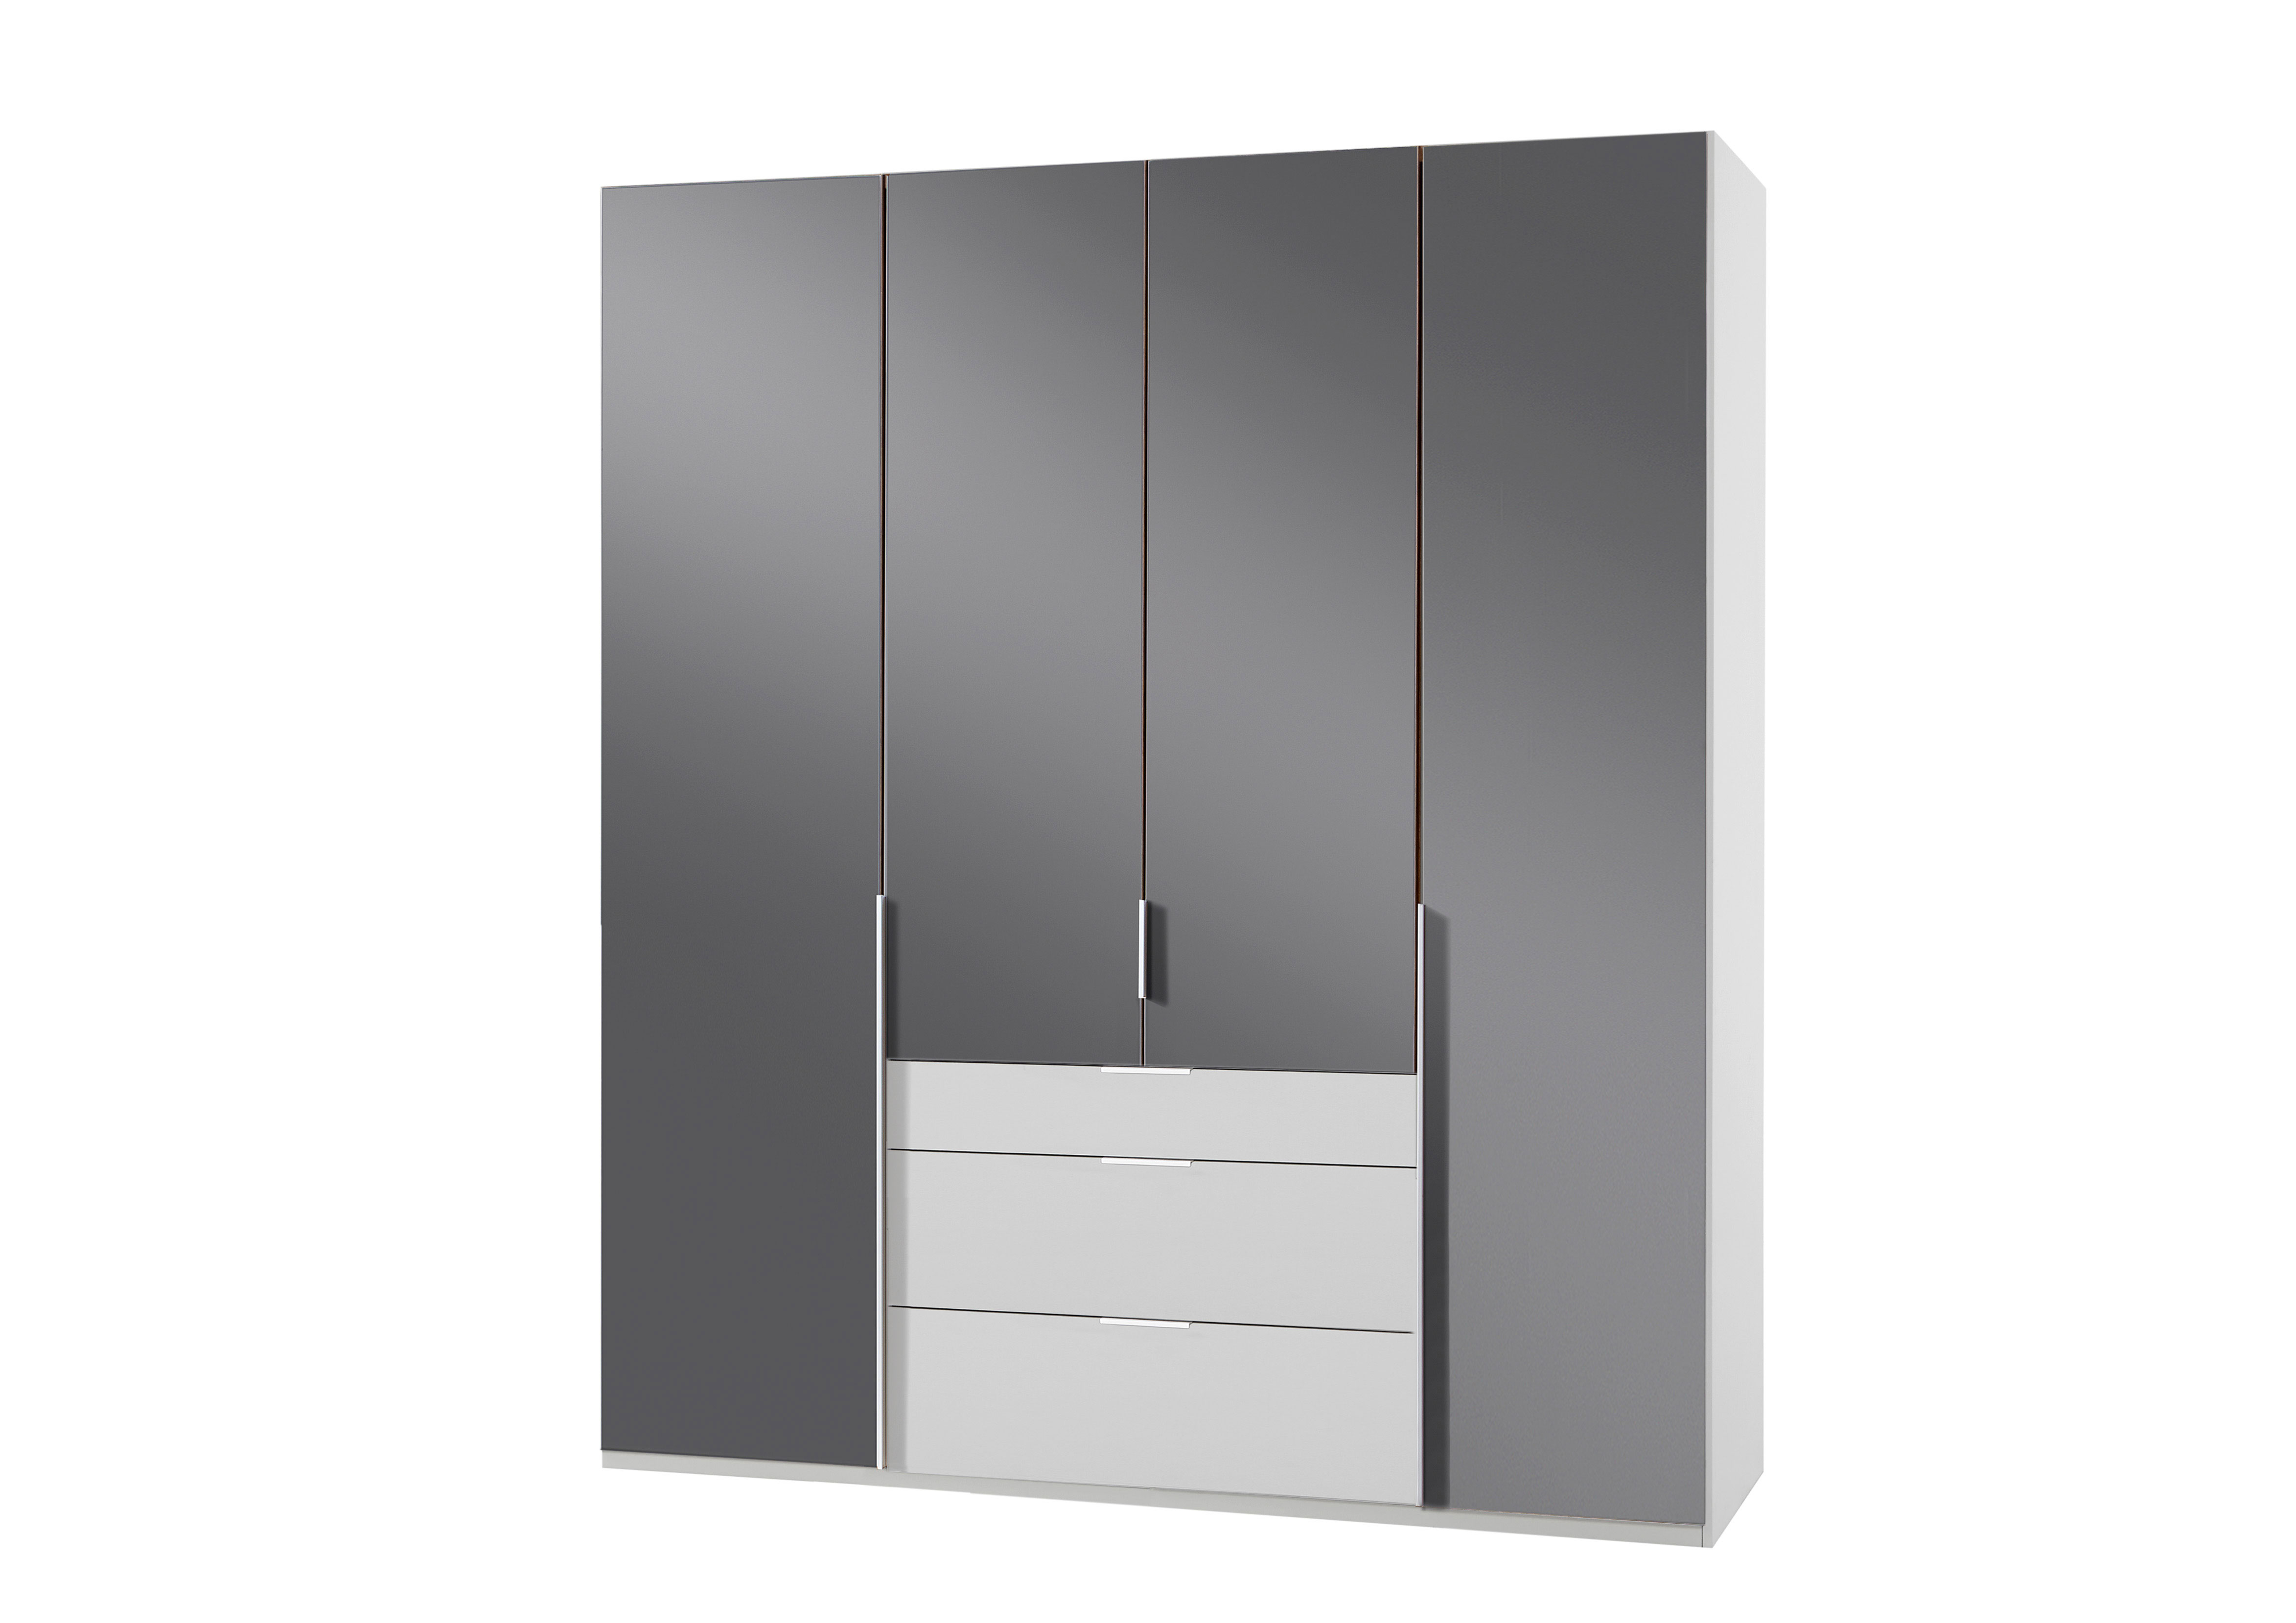 Armoire design 4 portes/3 tiroirs blanc alpin/verre gris Tony